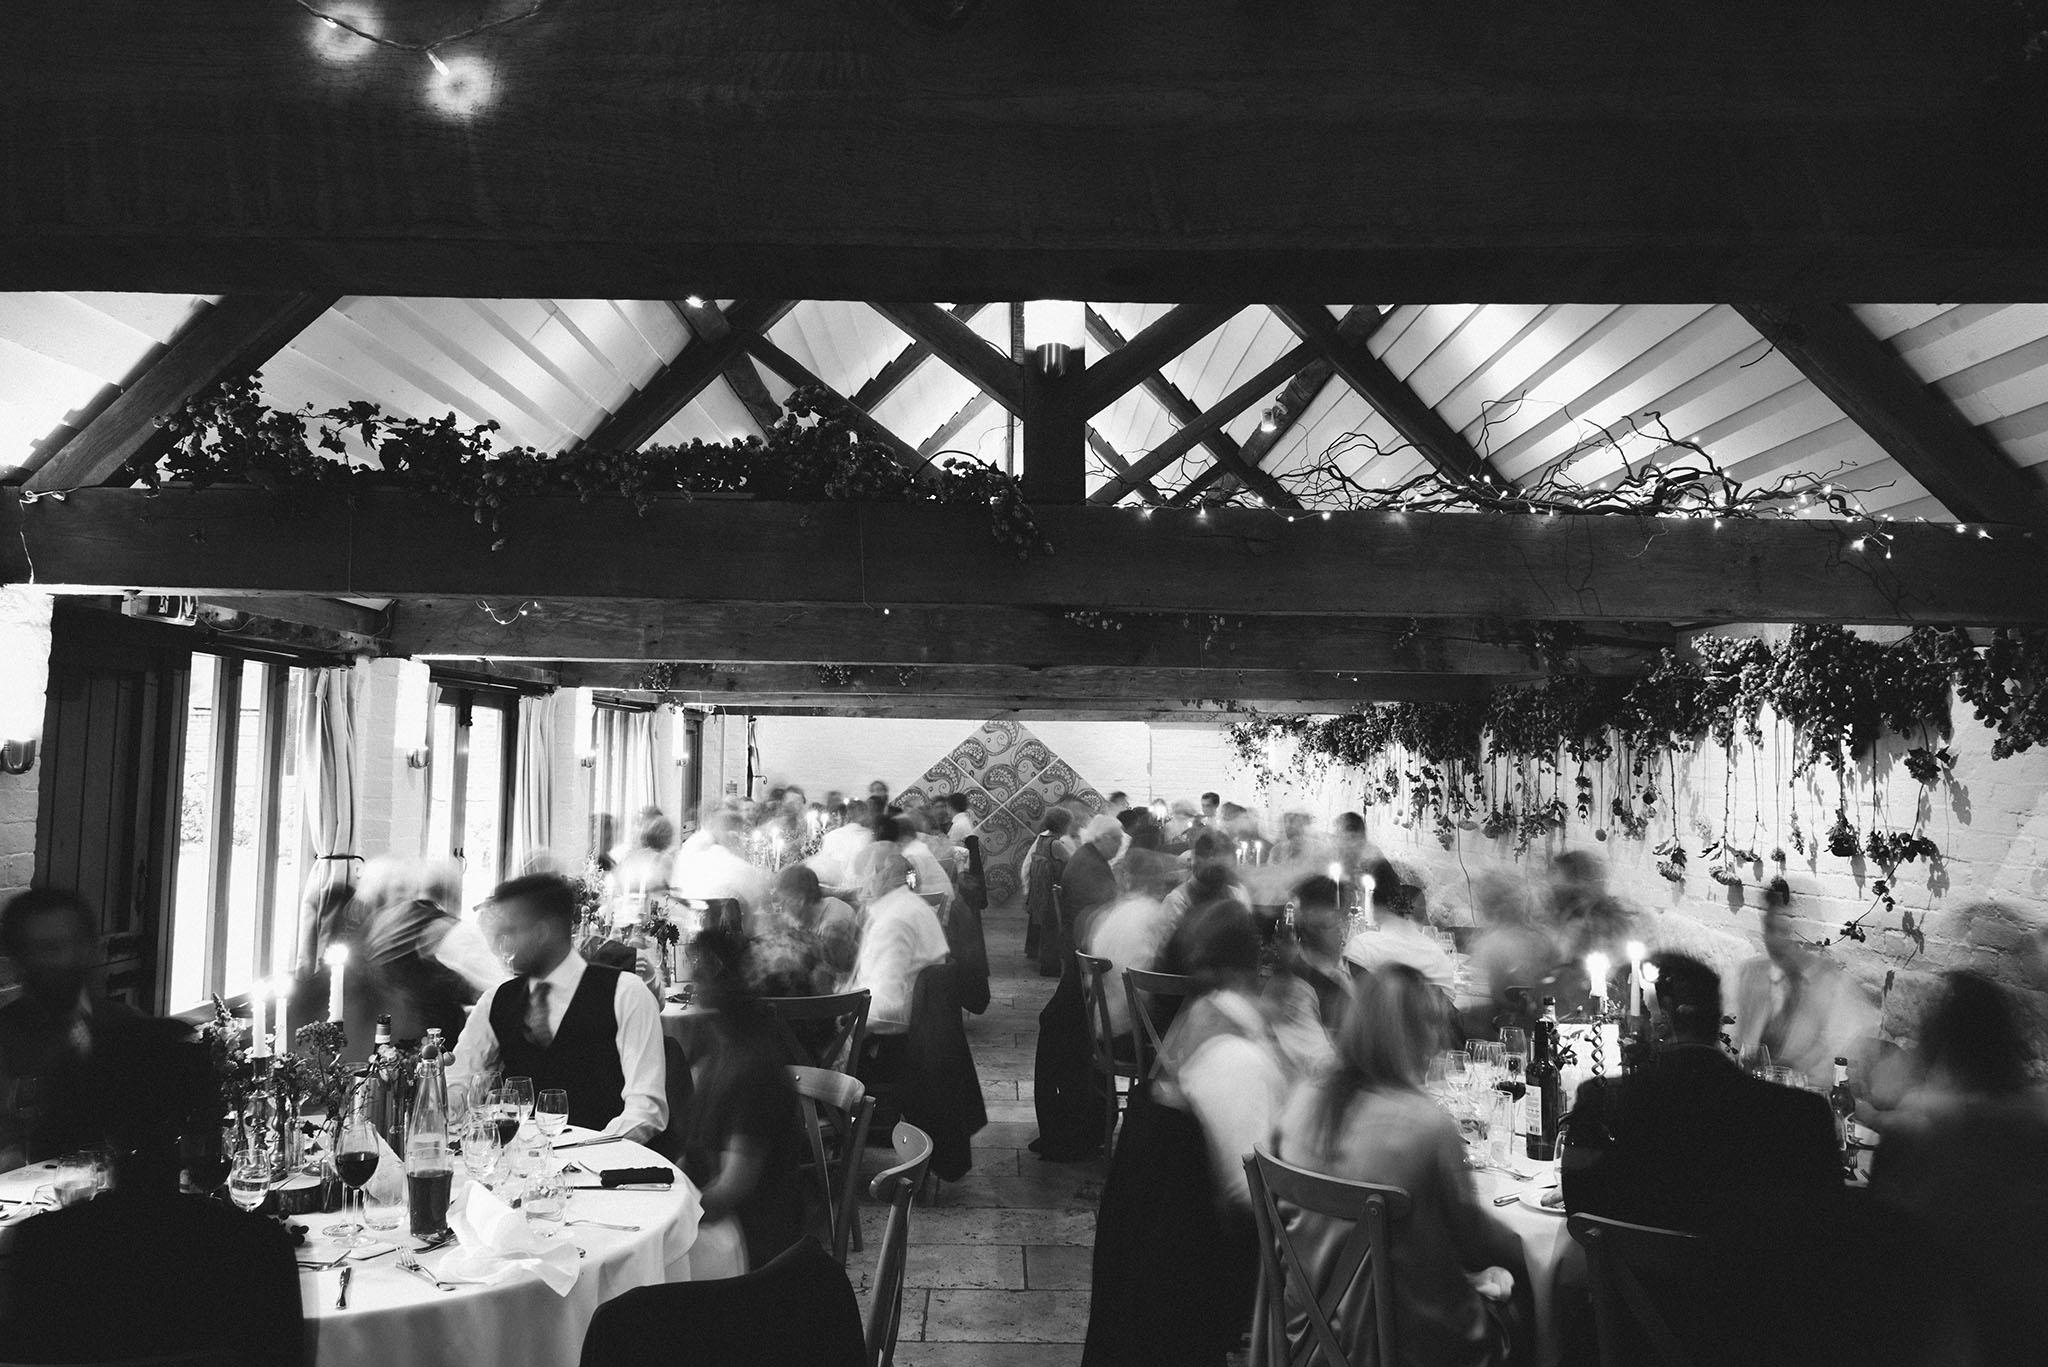 scott-stockwell-photography-wedding-54.jpg